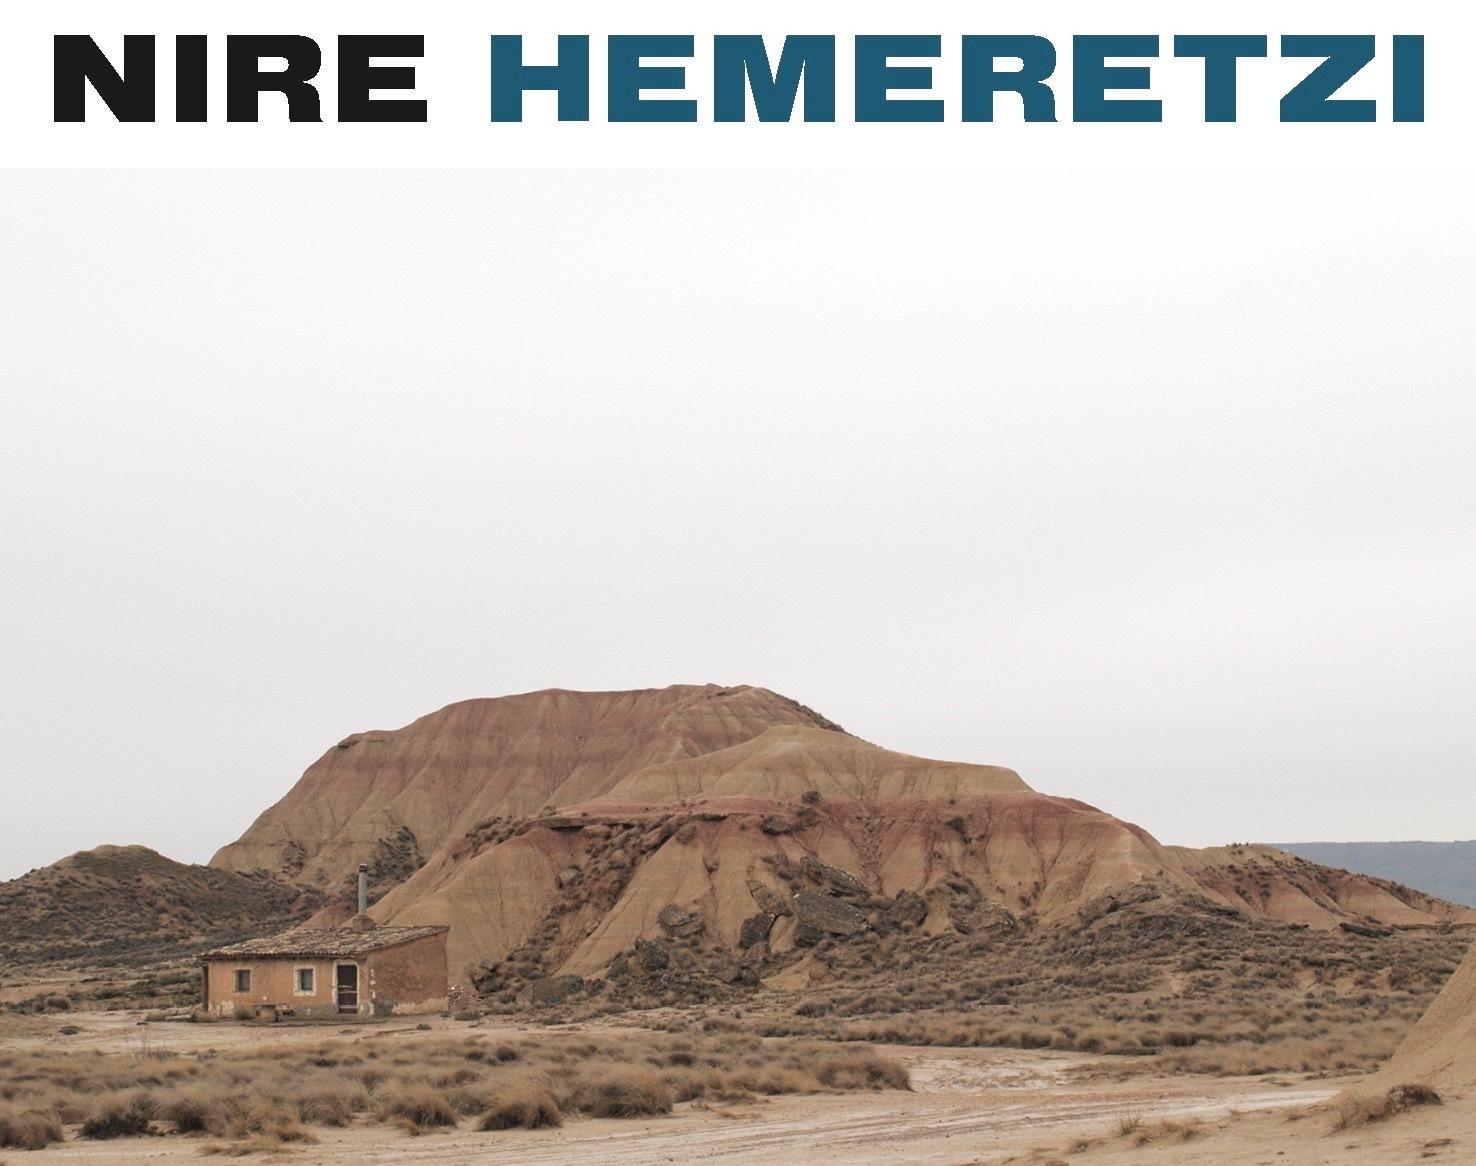 Nire_Hemeretzi